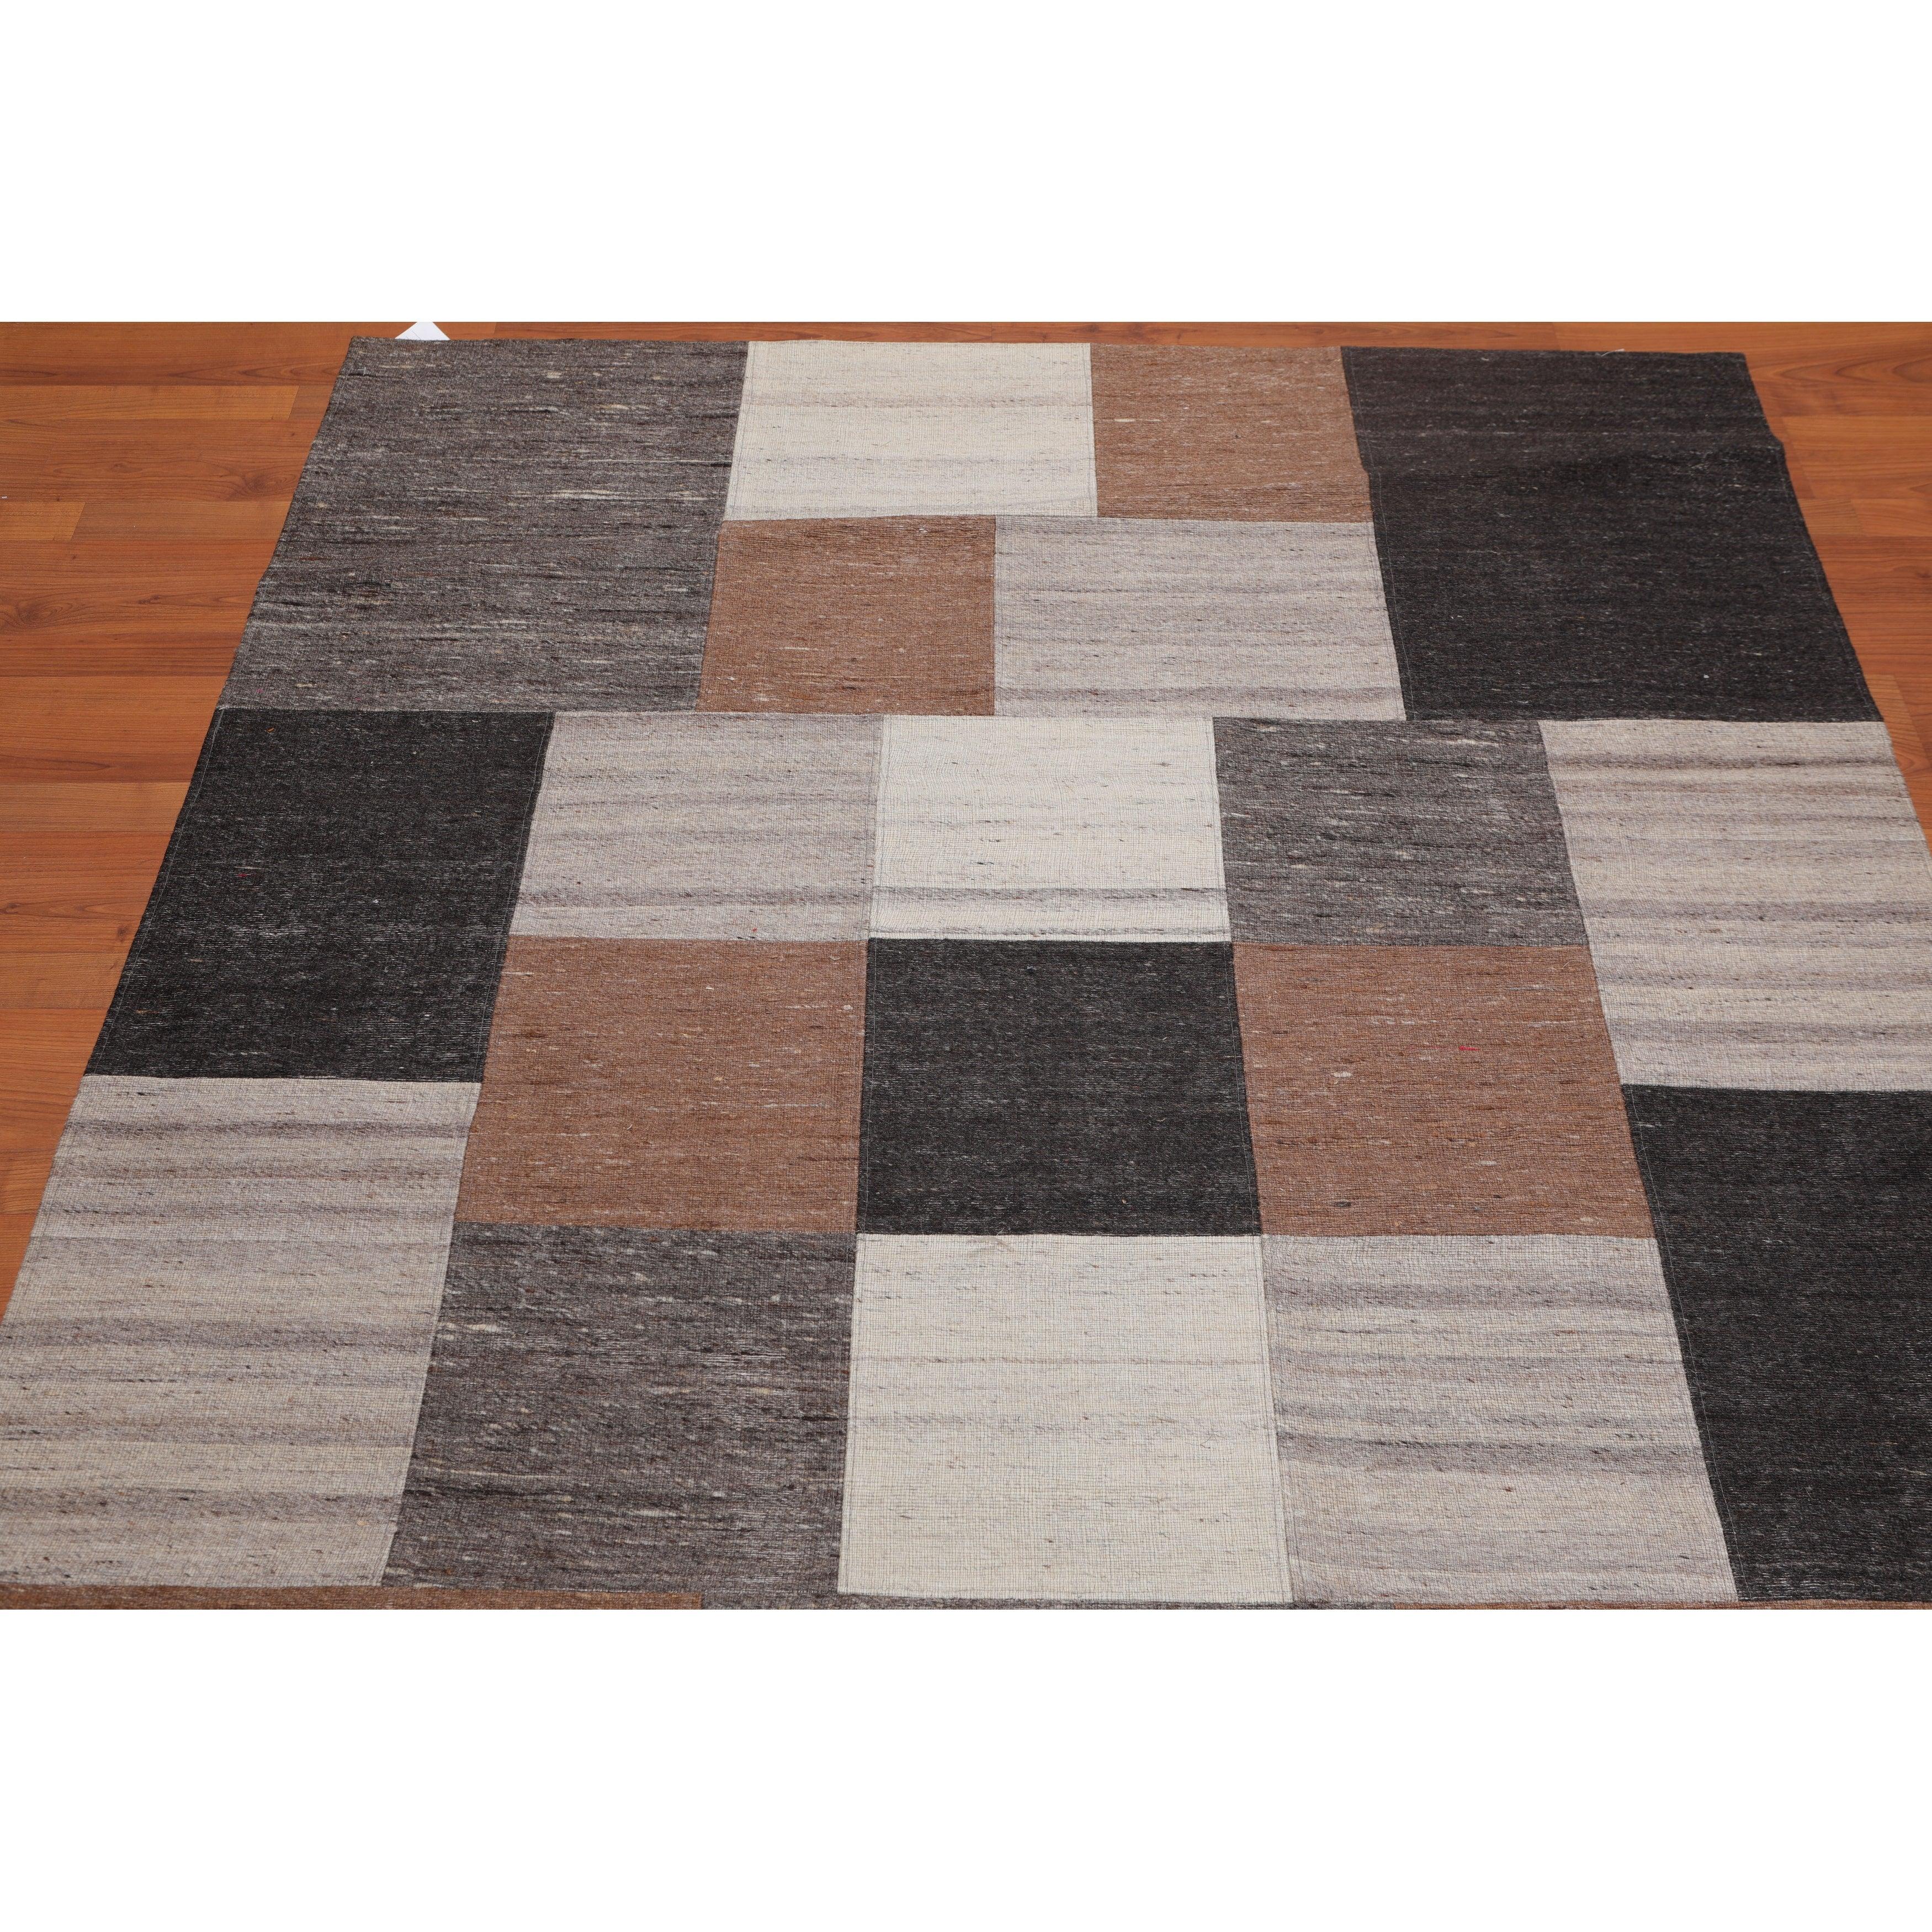 Hand Woven Geometric Earth Tones Beige Flatweave Wool Modern Contemporary Oriental Area Rug 5x7 5 X 7 Overstock 31510827